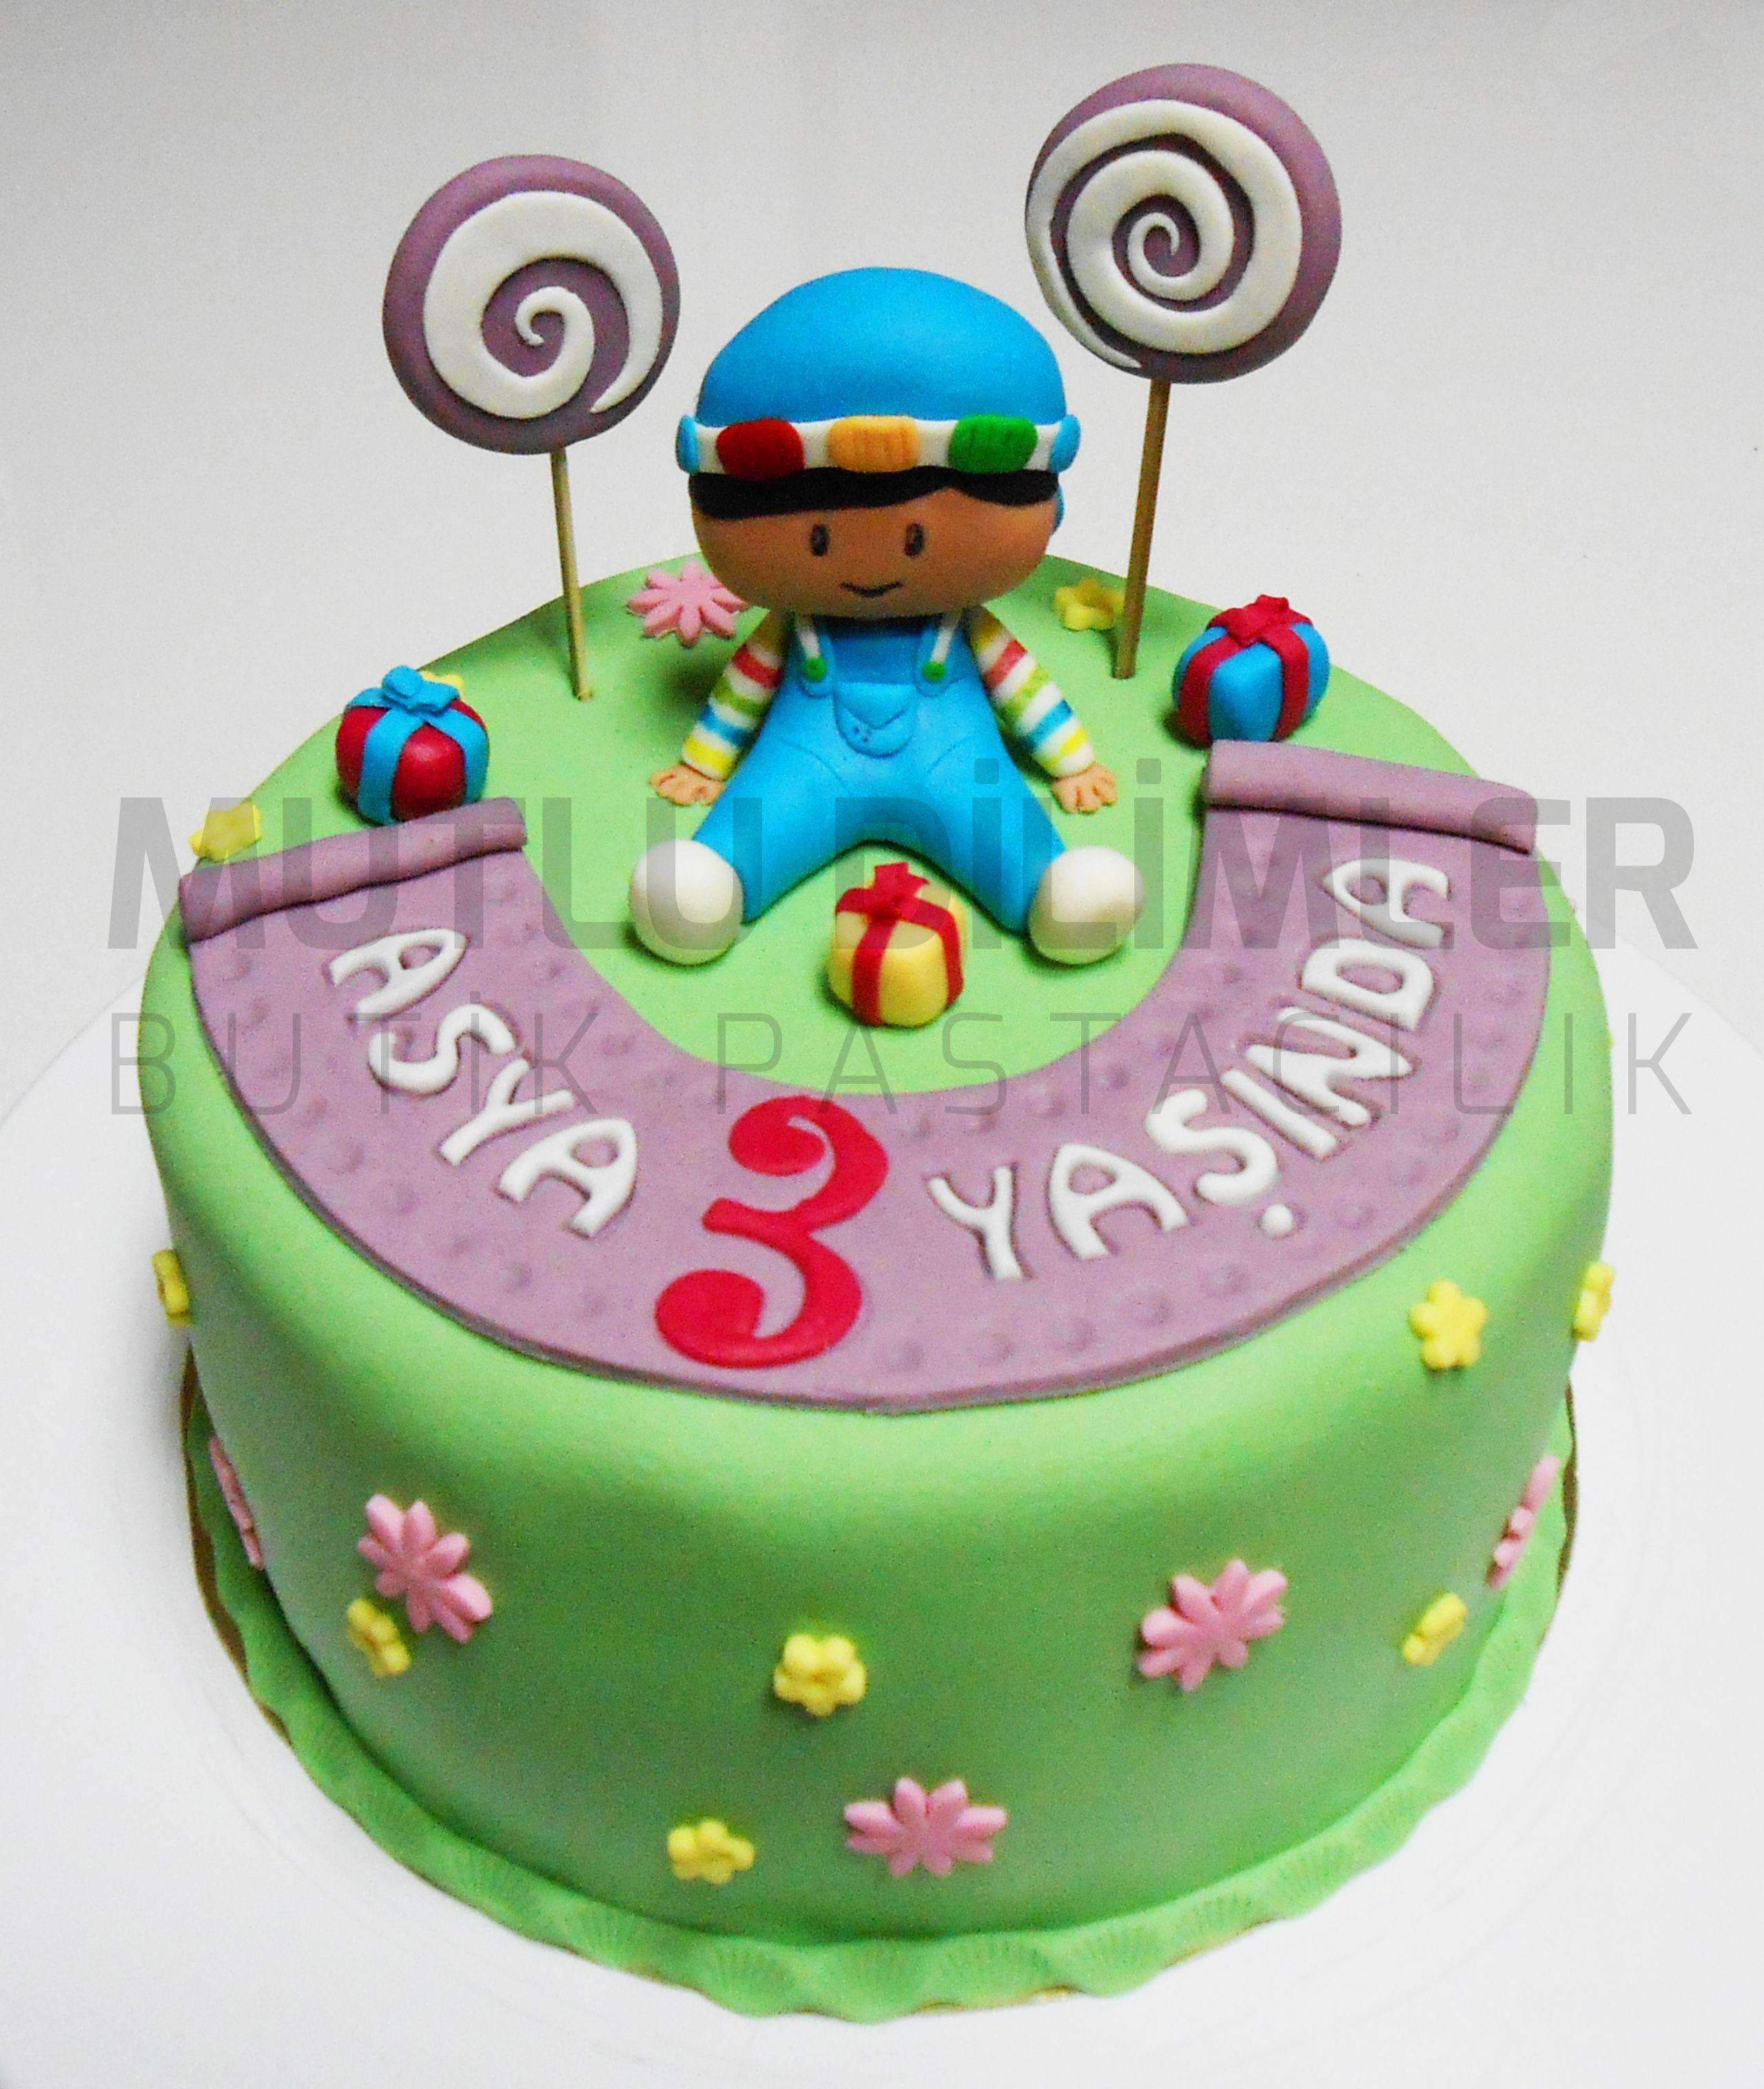 pepe cake 3 years old cake birthday cake girl cake pepe